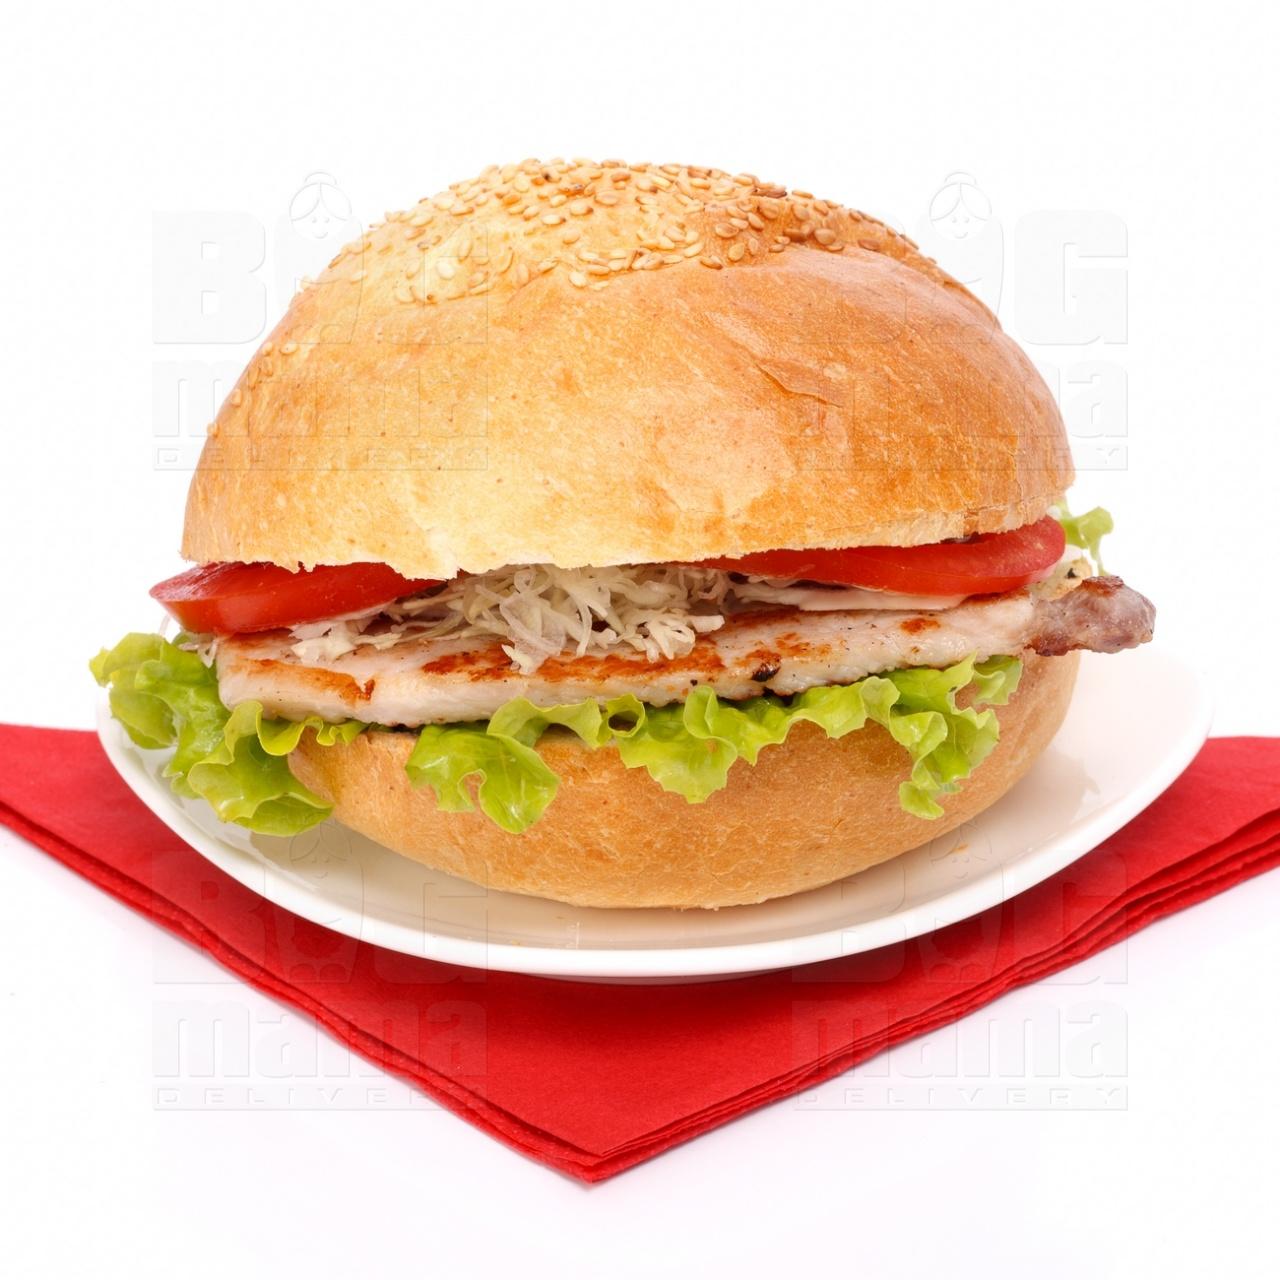 Product #47 image - Sandviş mic cu cotlet de porc la grătar